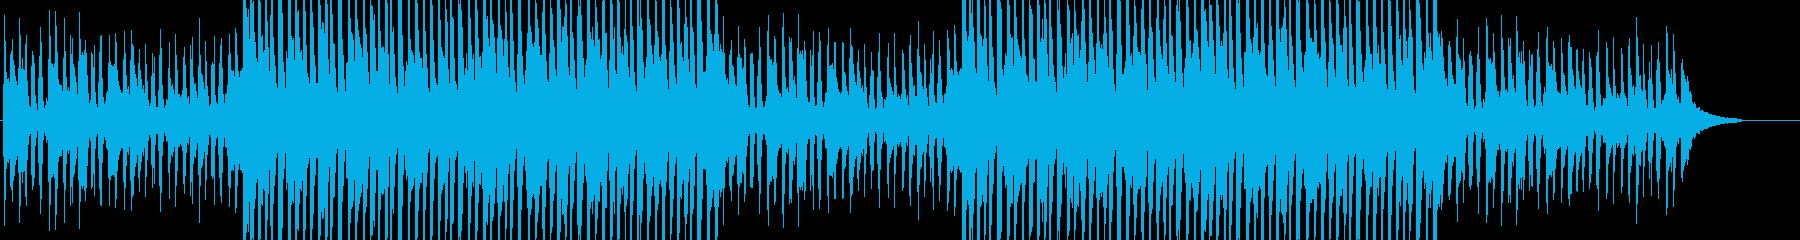 Happy Ukulele 1の再生済みの波形